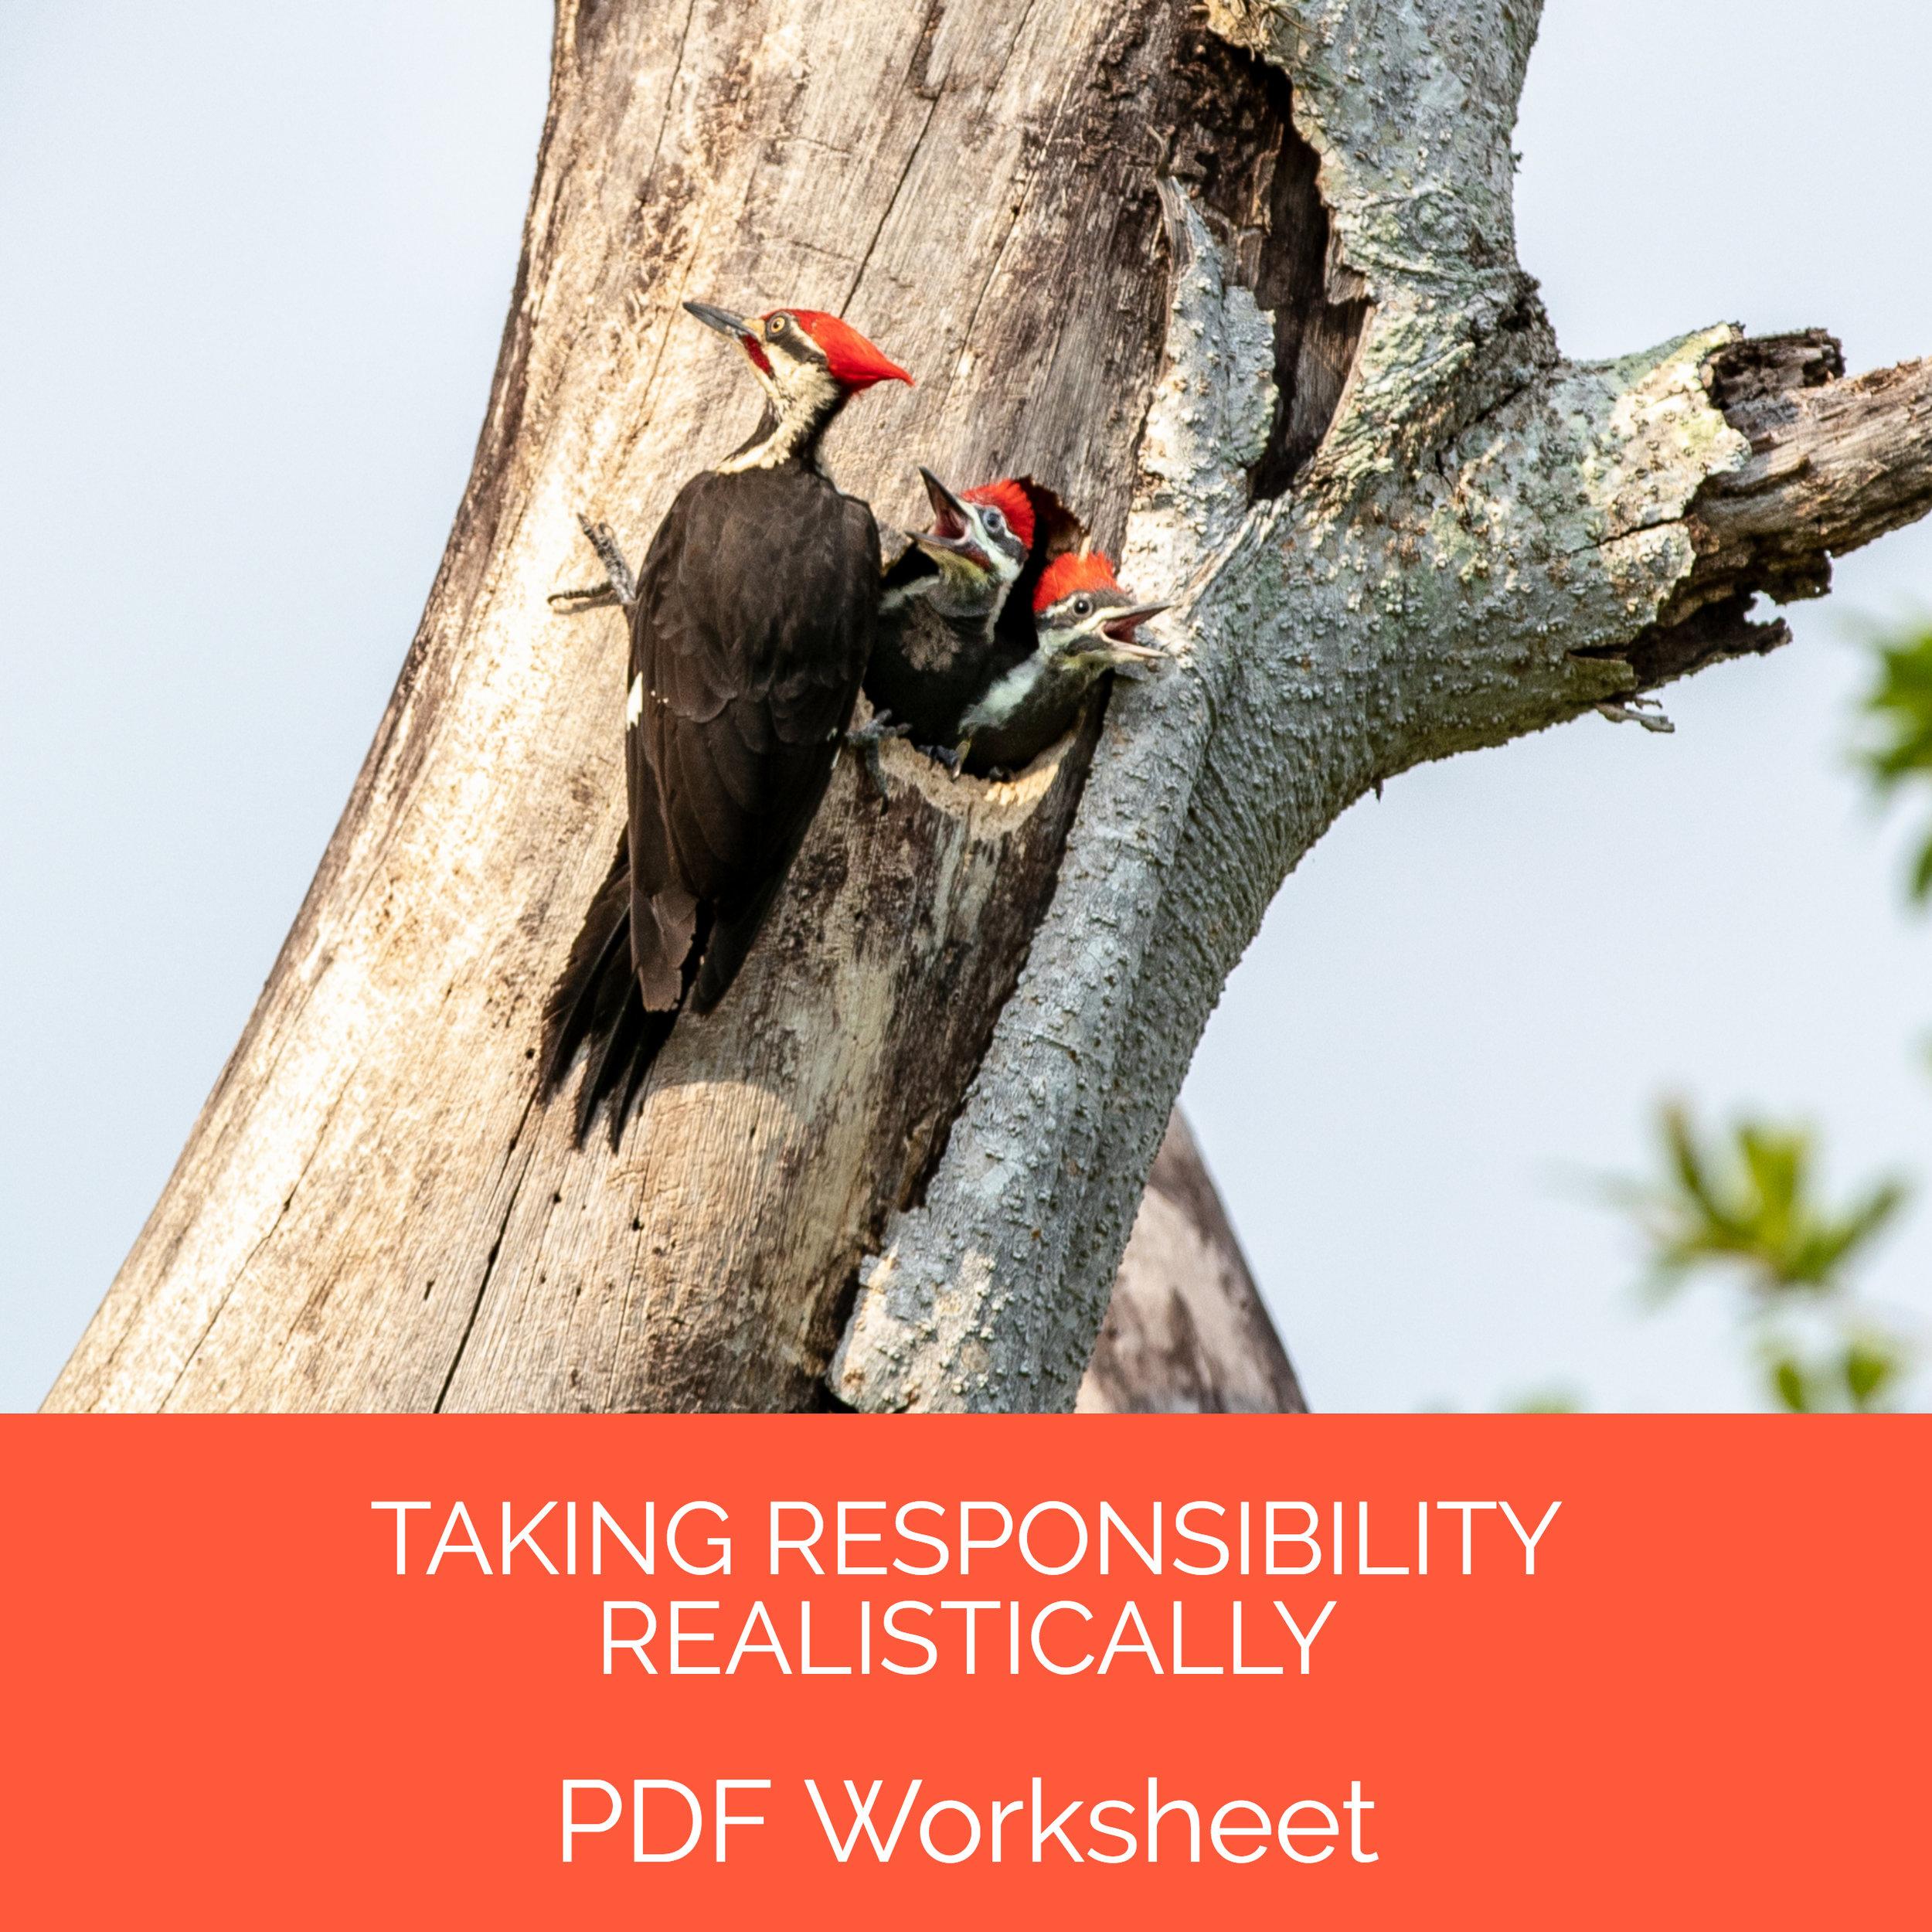 Taking Responsibility Realistically.jpg